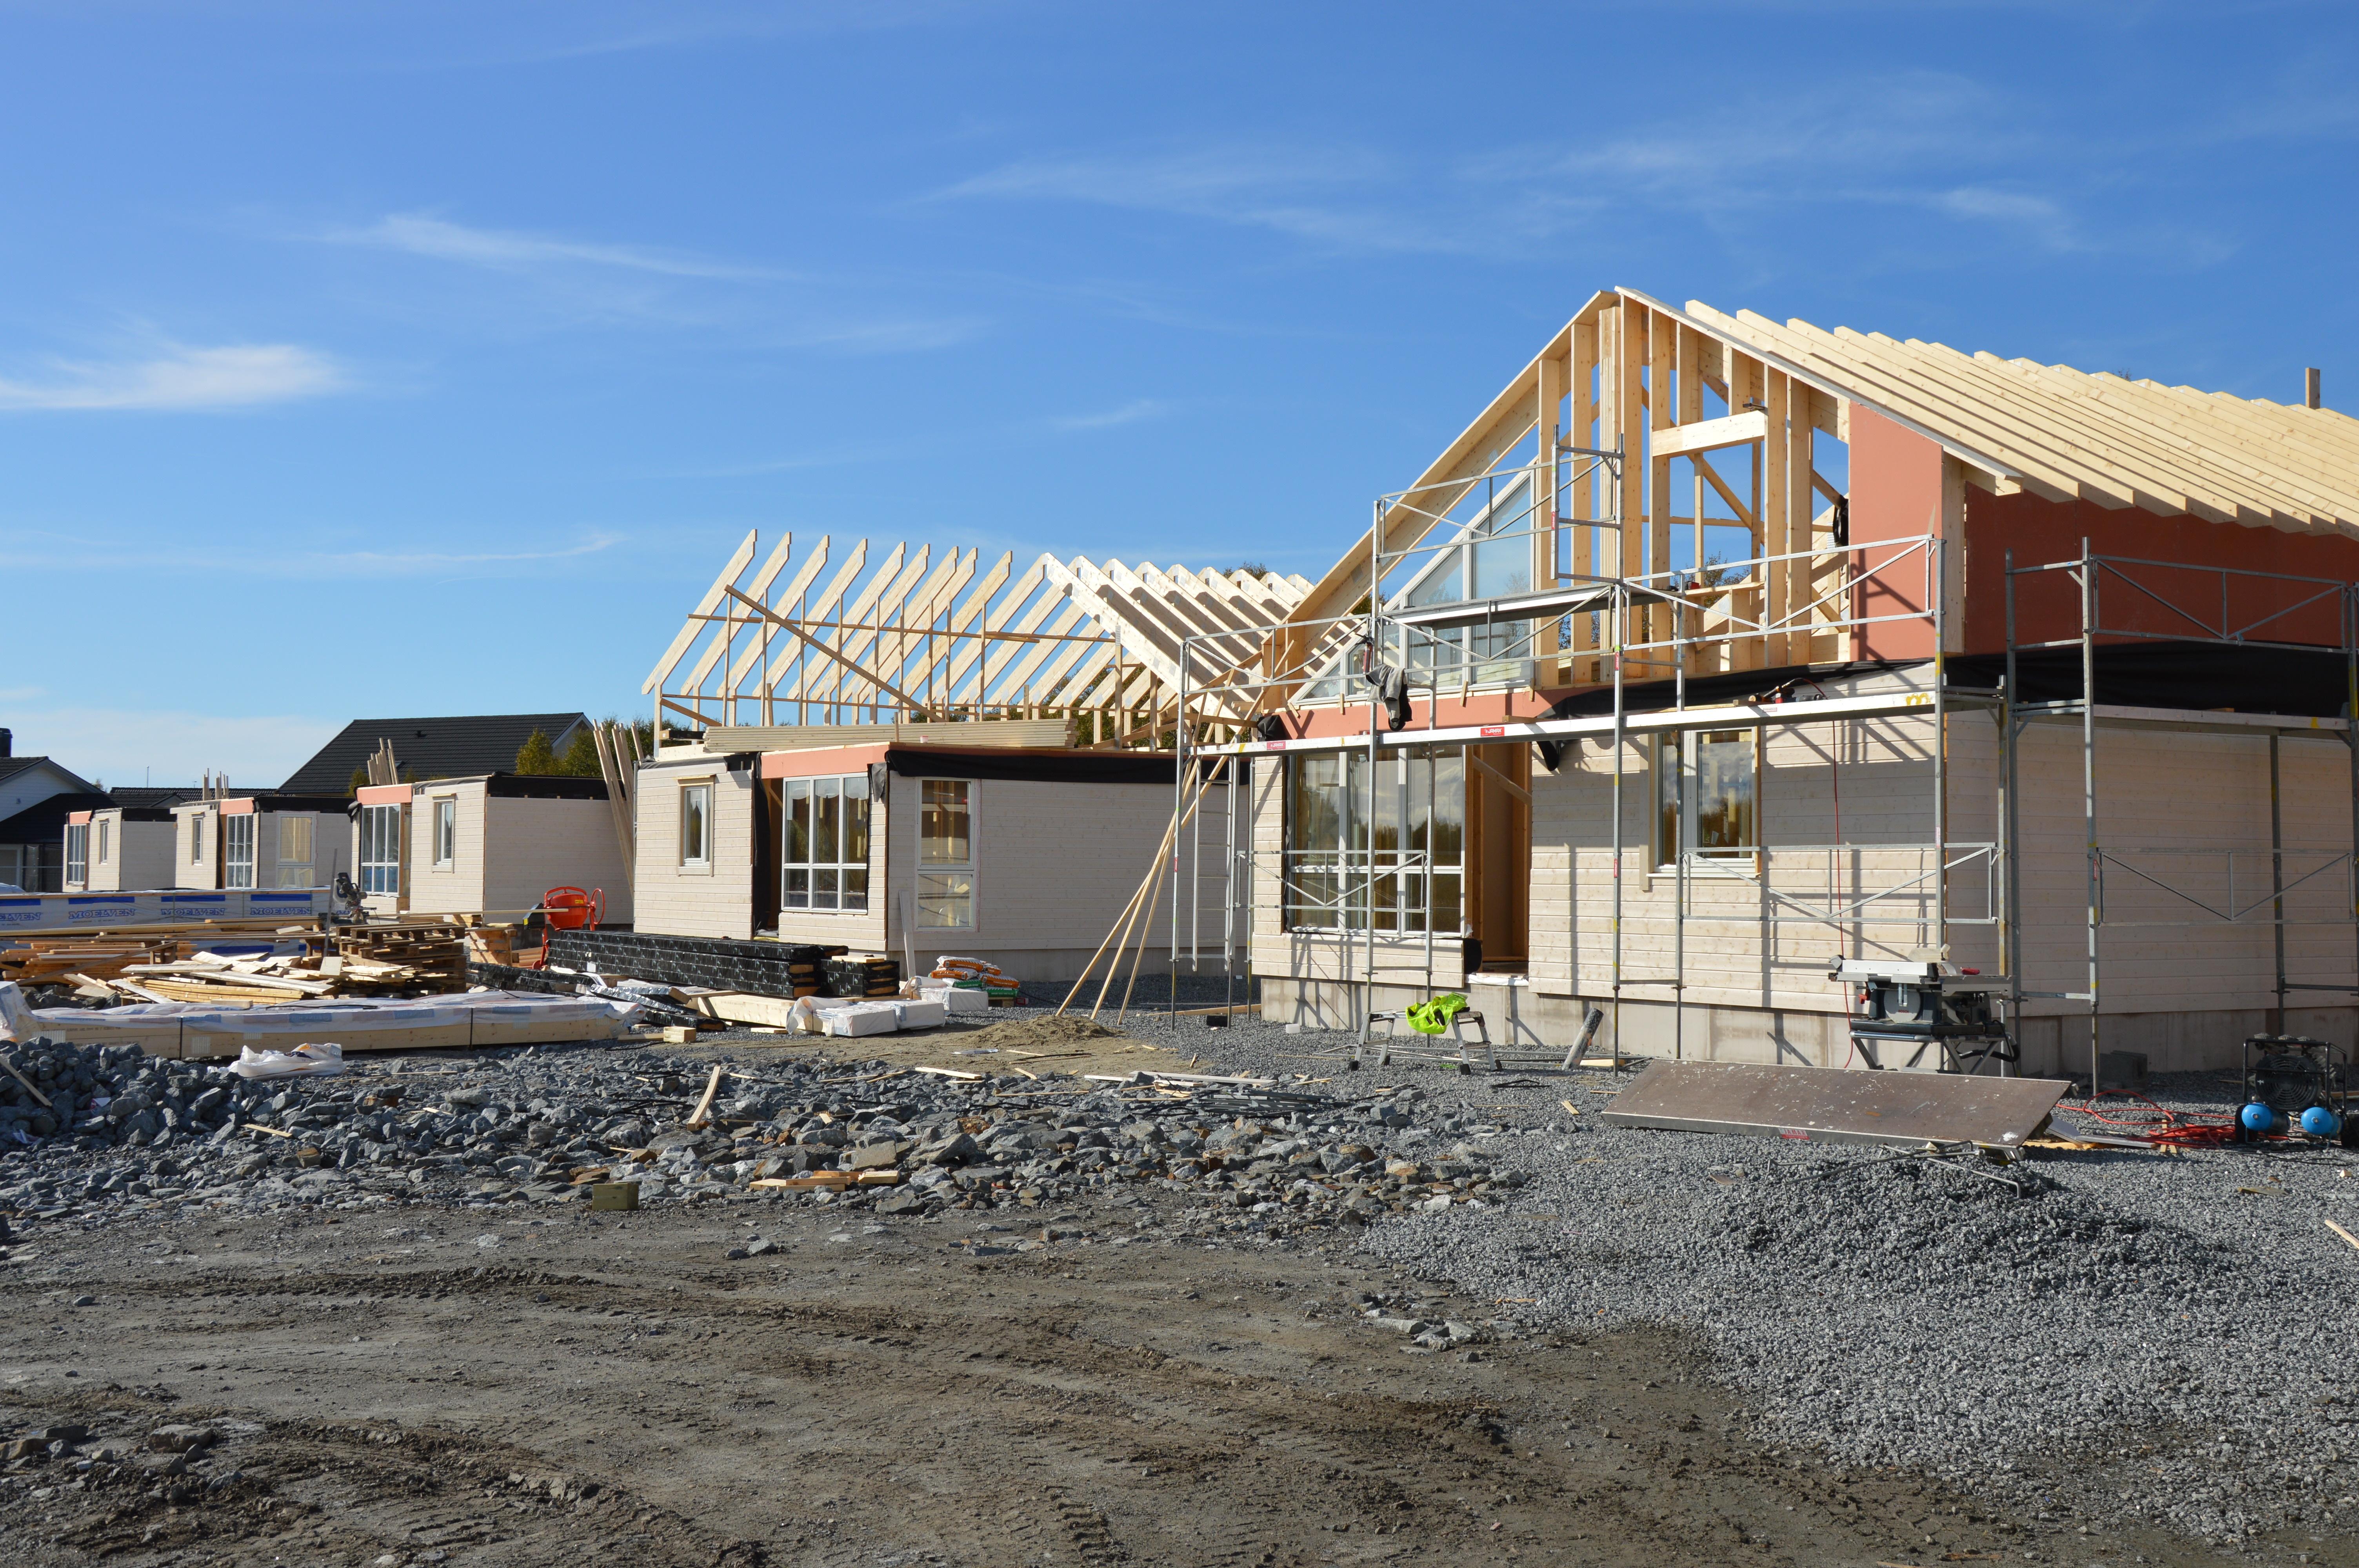 Stor boligsatsing i Herøy gjennom Herbo_ nye boliger under bygging